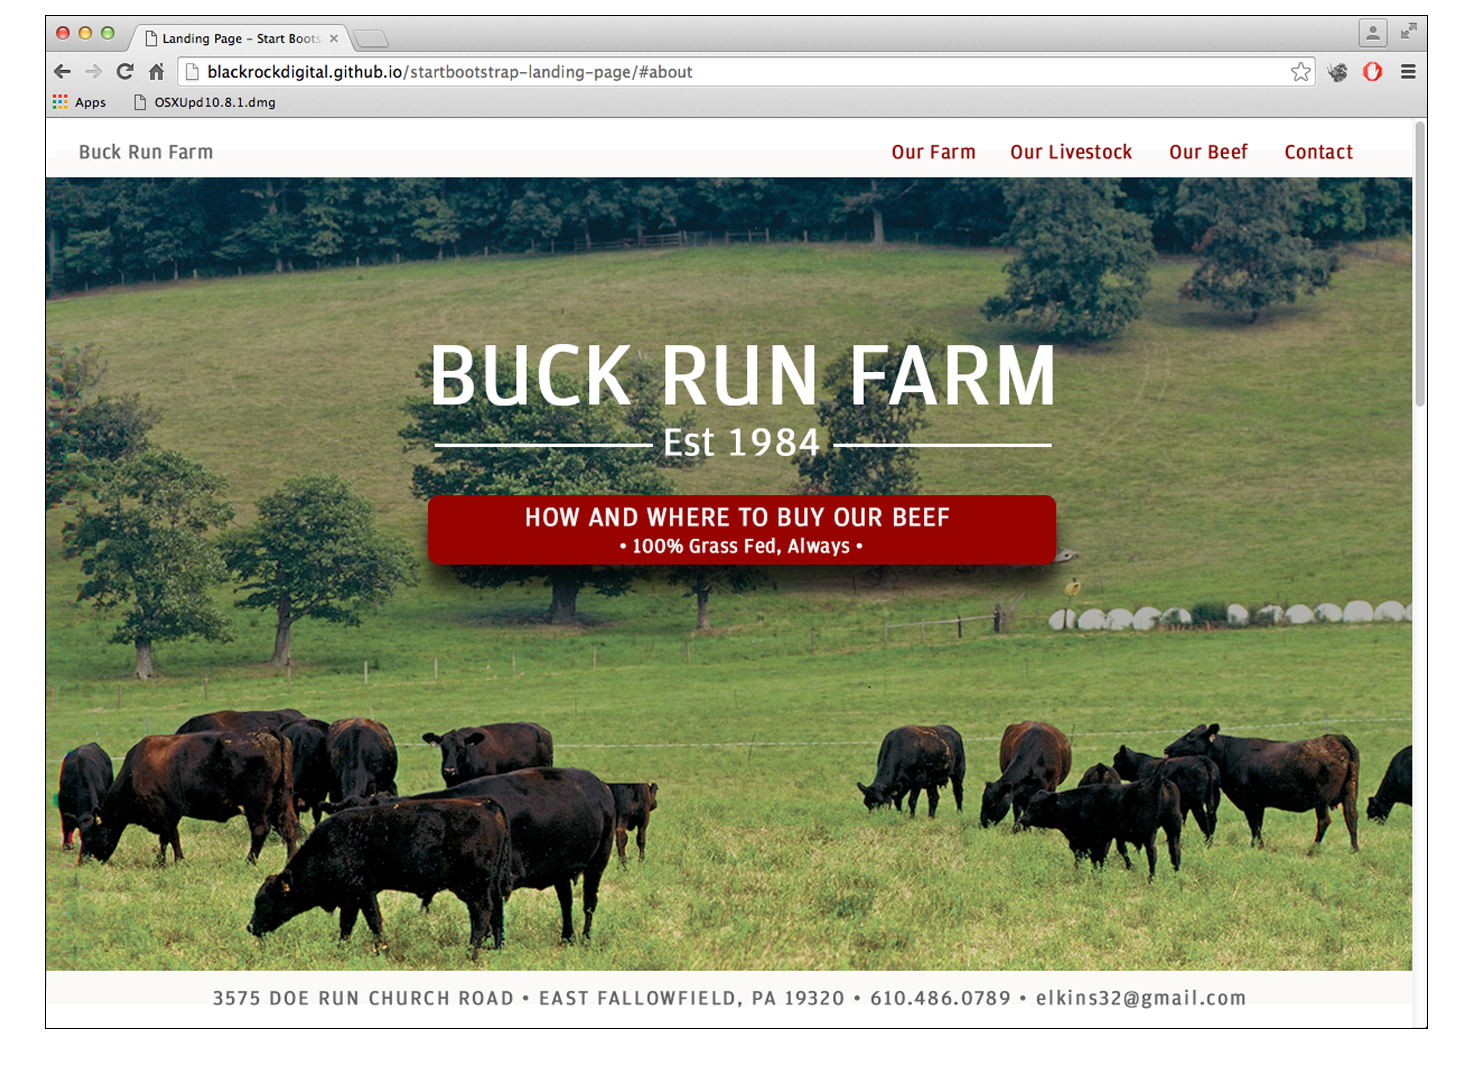 1buckrunfarm.png